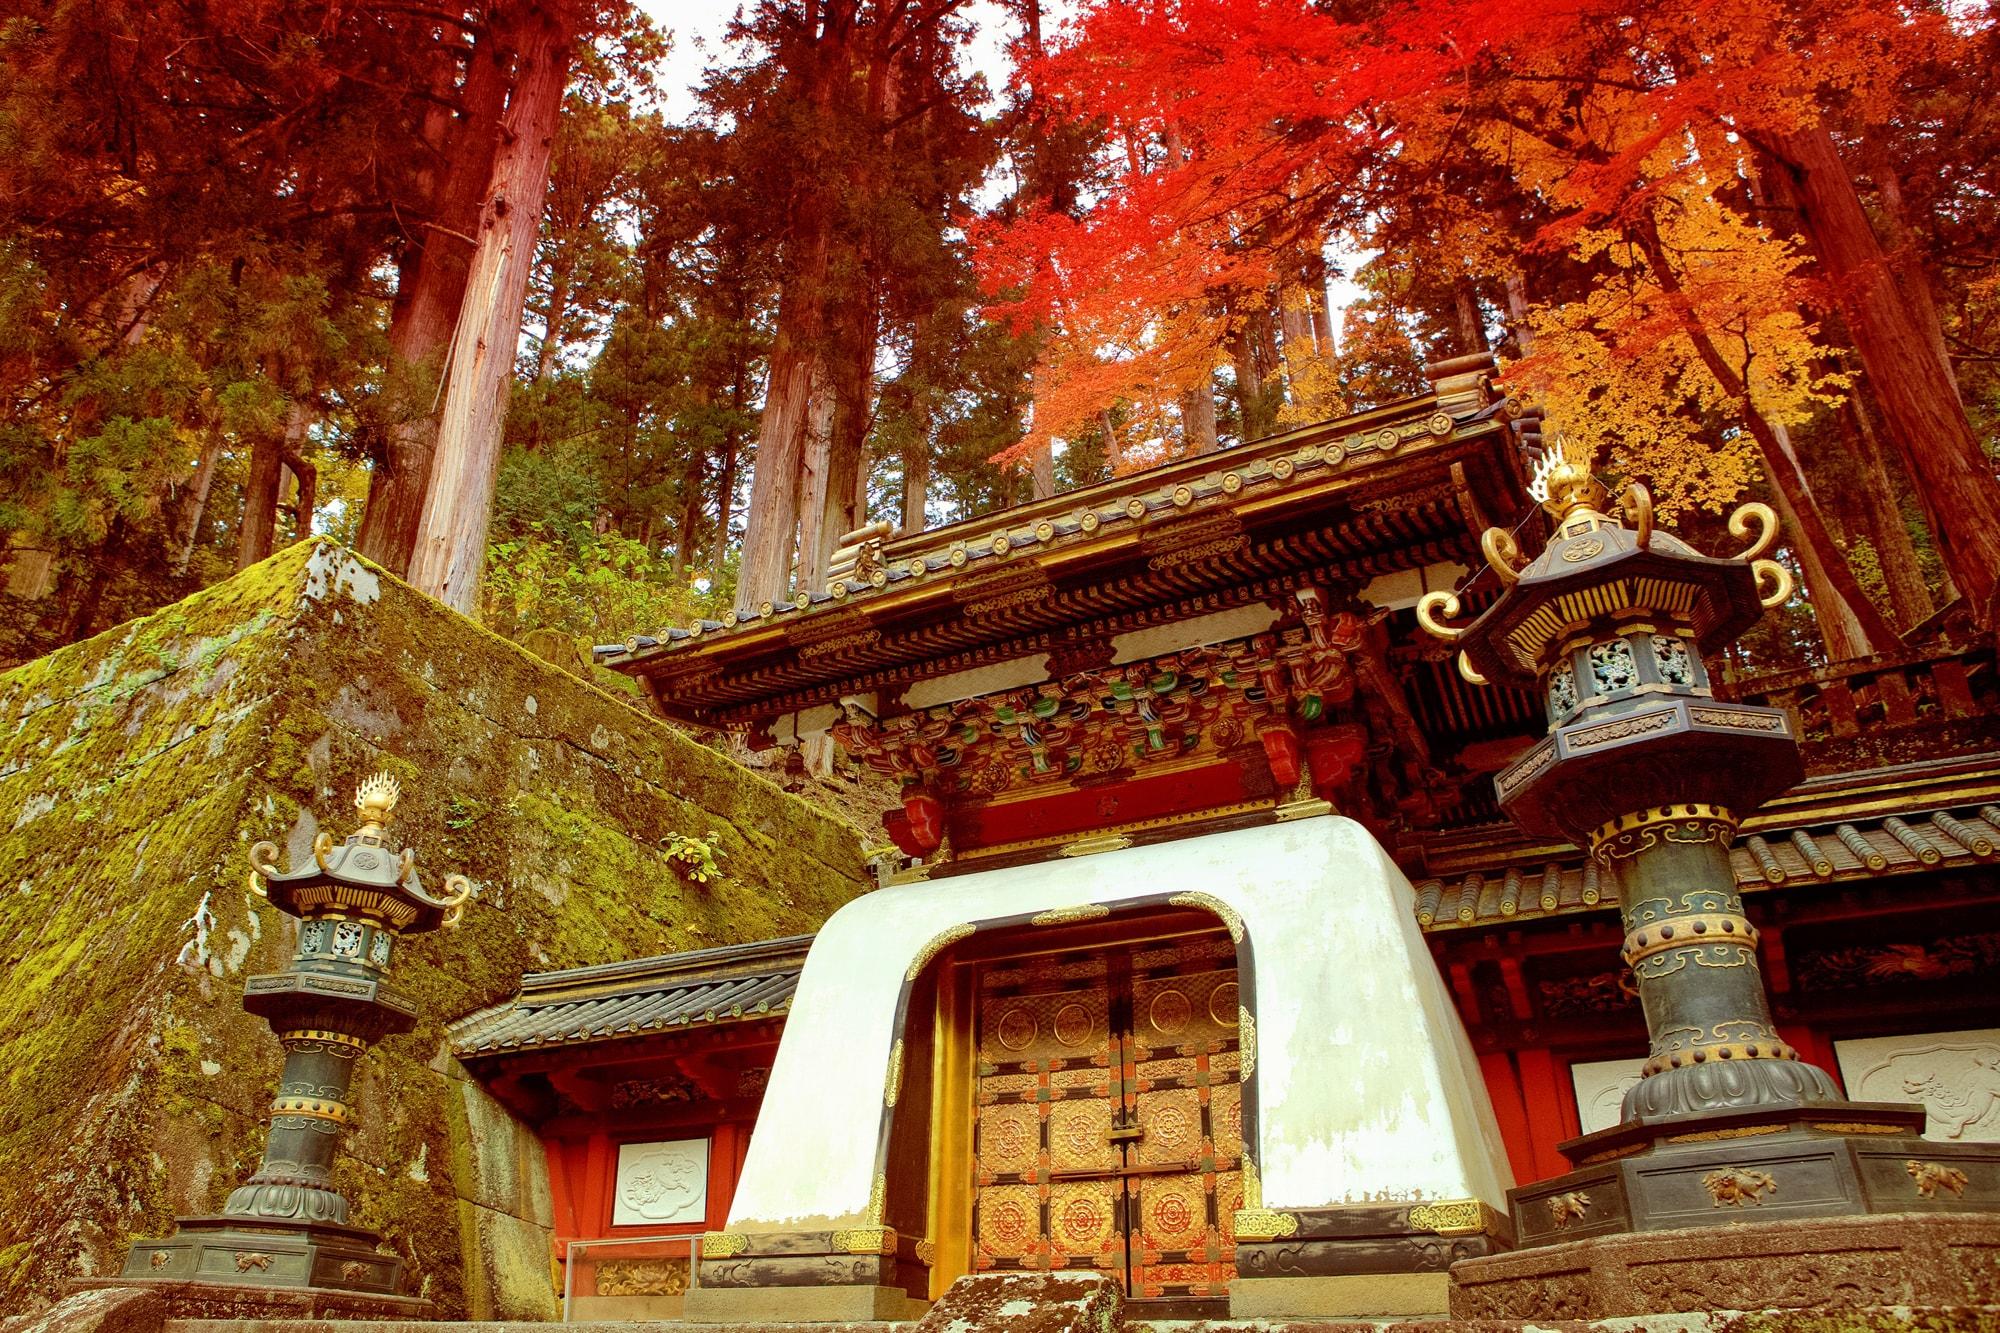 entrance to iemitsu's grave nikko day trip